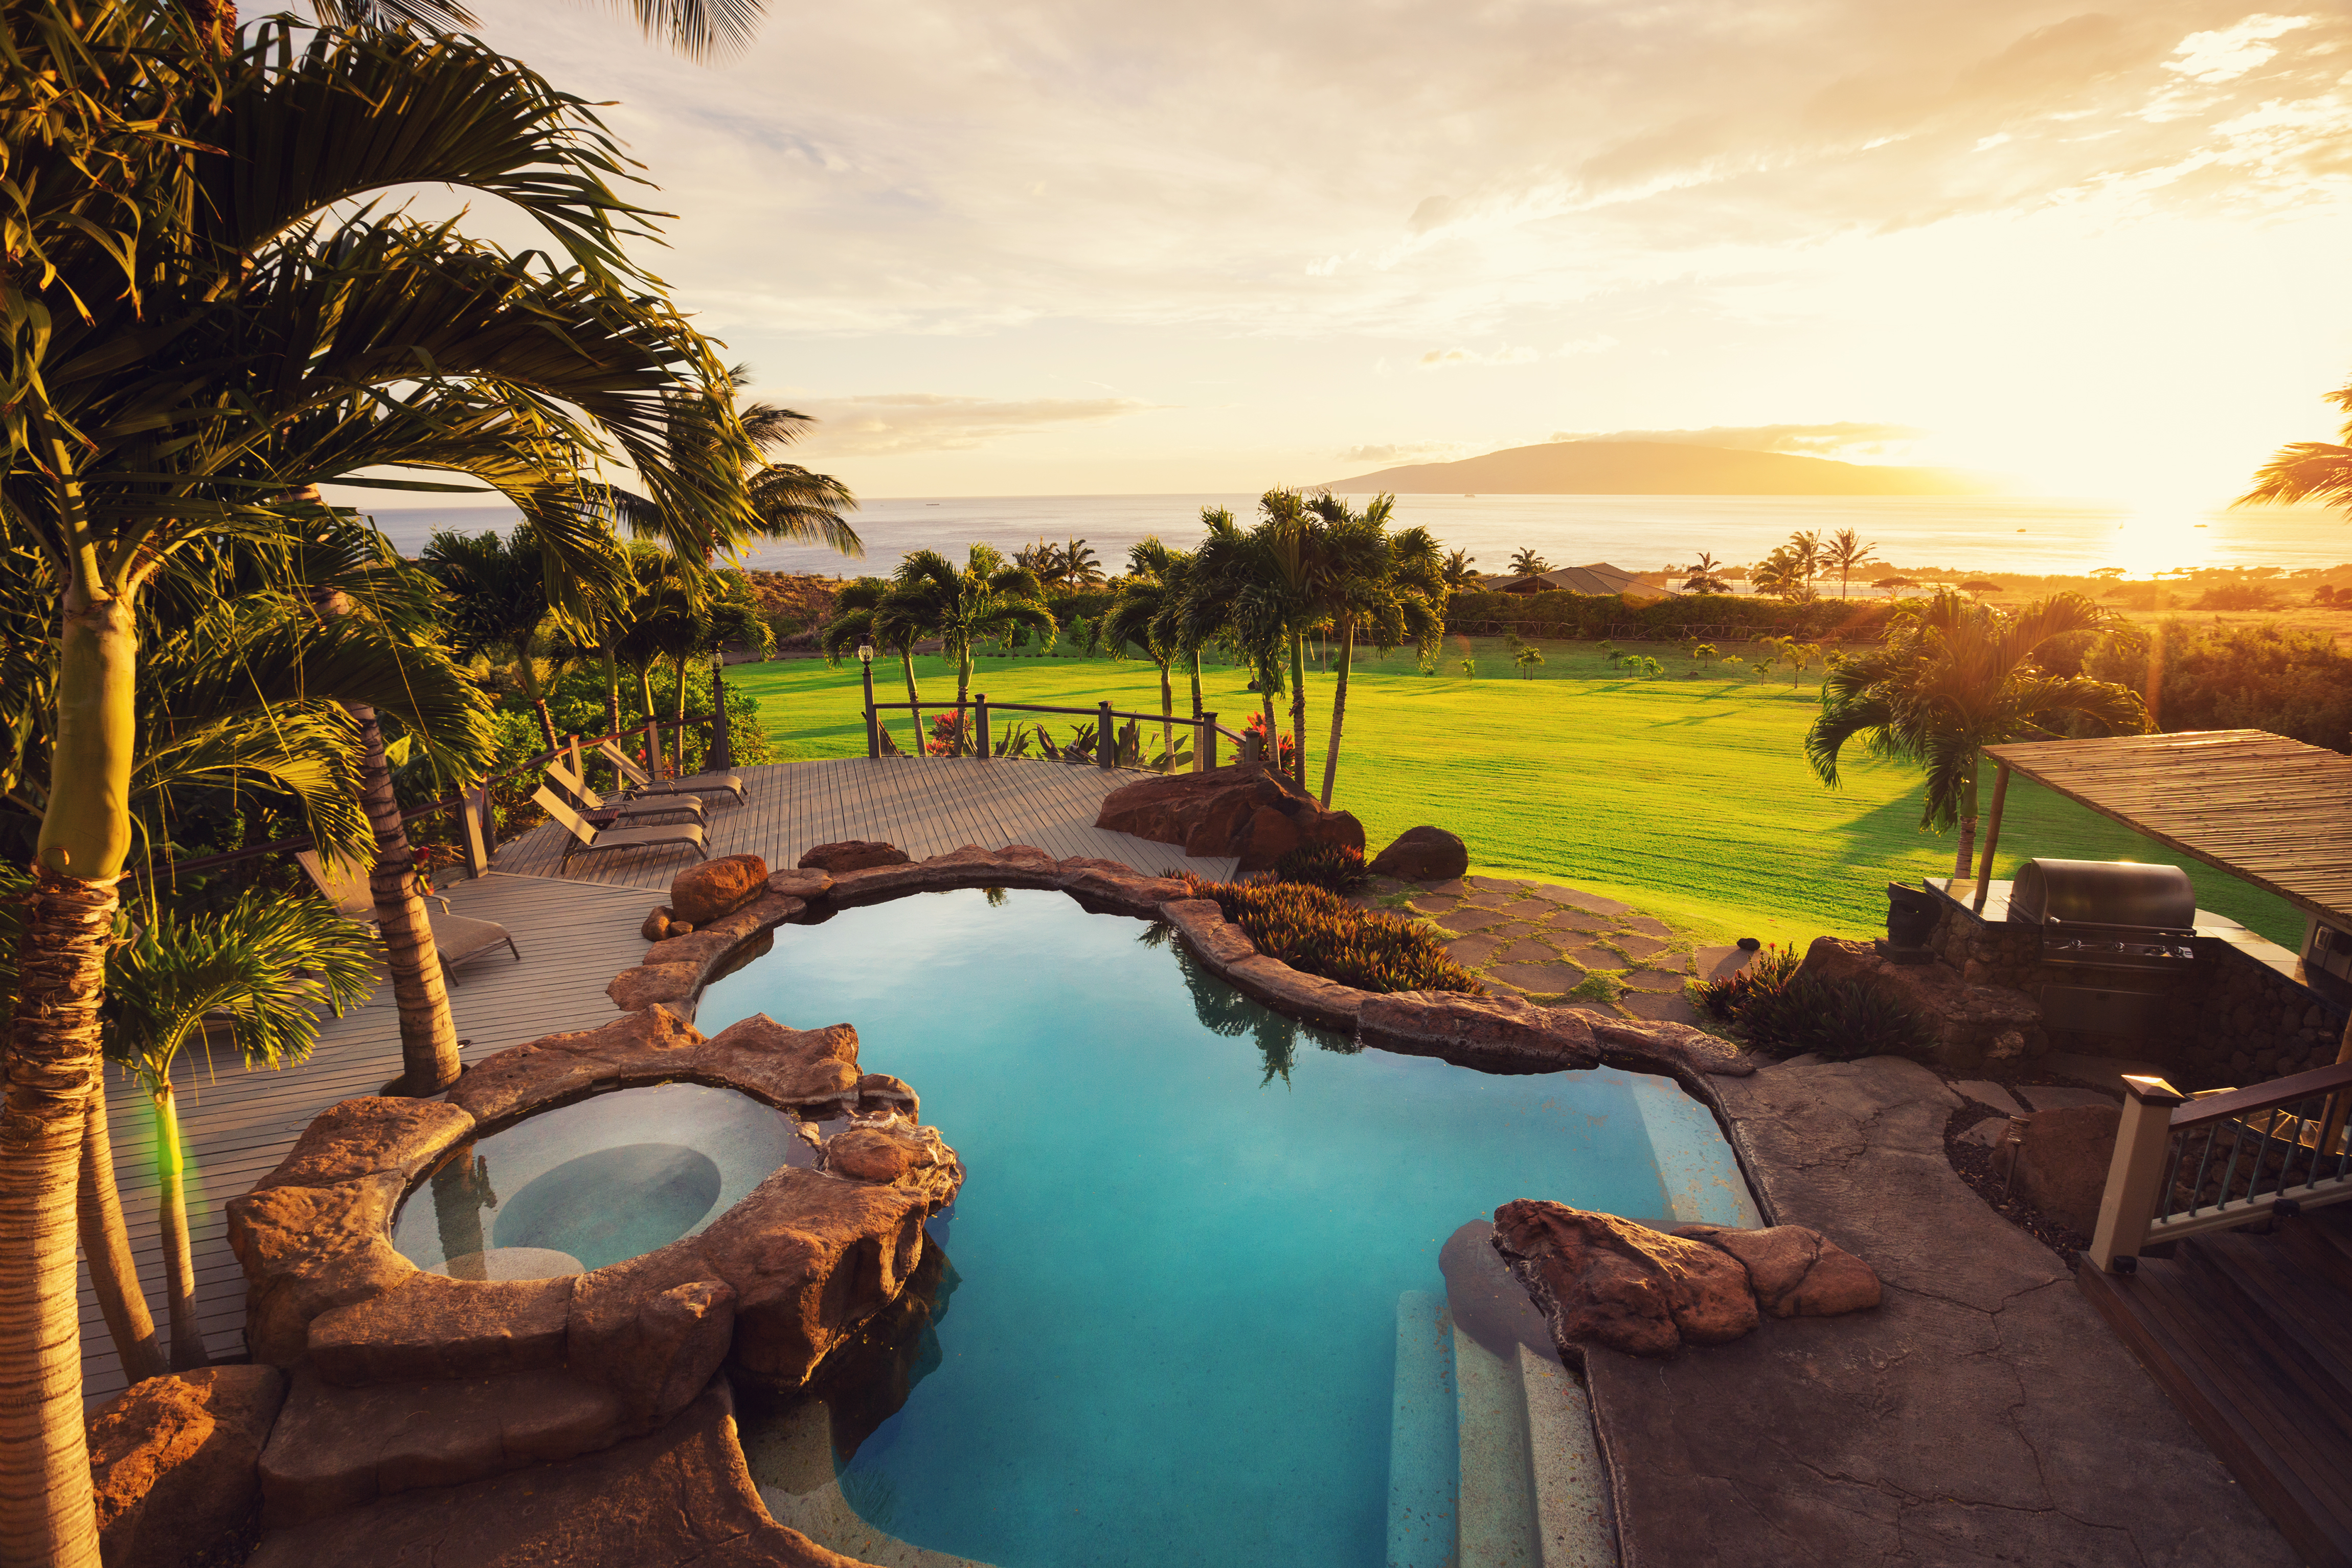 hawaii luxury real estate  west hawaii real estate, Luxury Homes